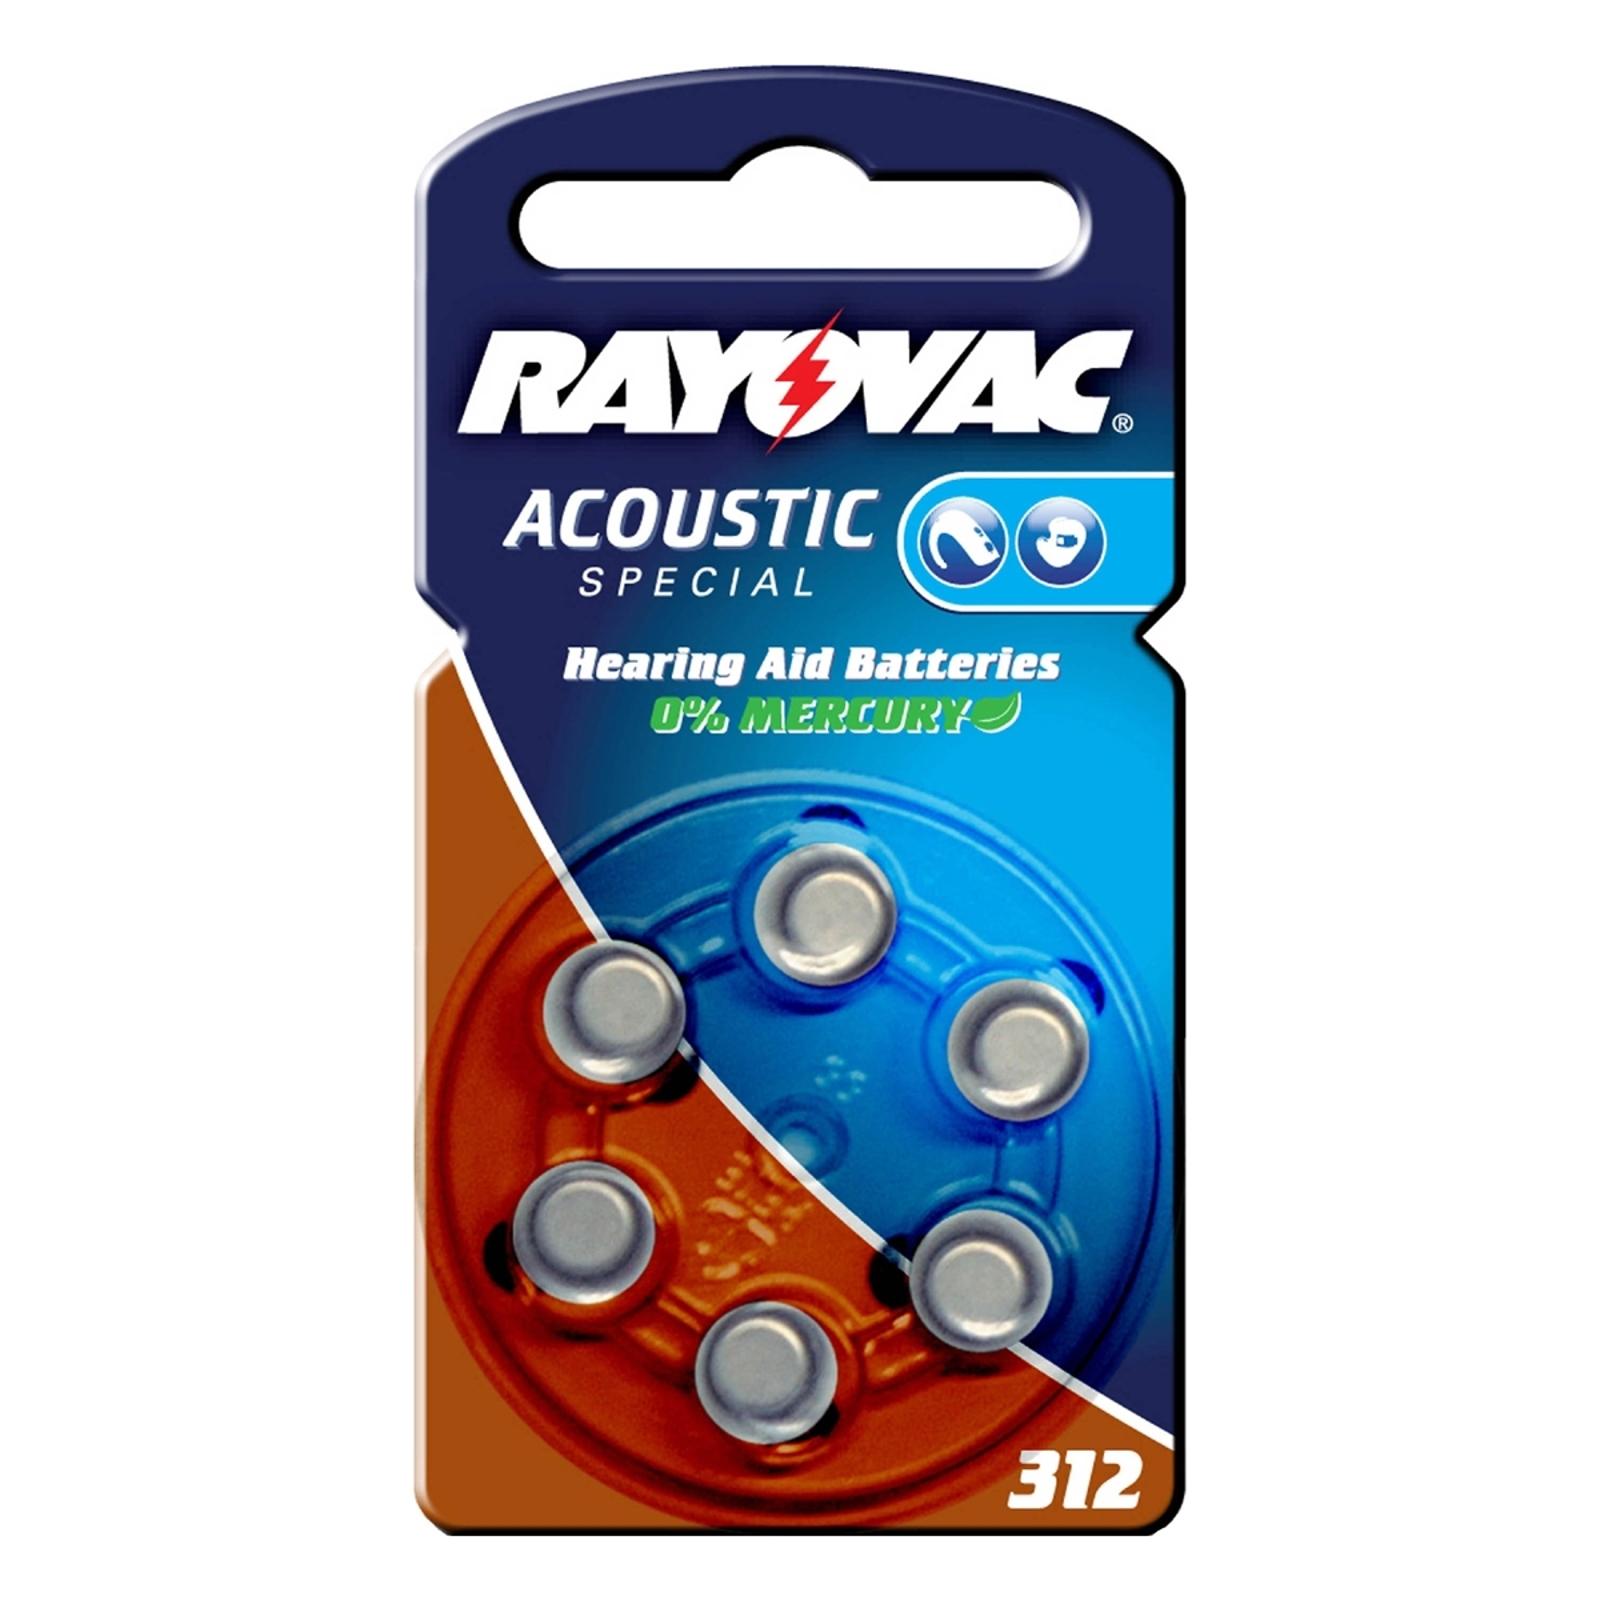 Mała bateria Rayovac 312 Acoustic 1,4V, 180m Ah